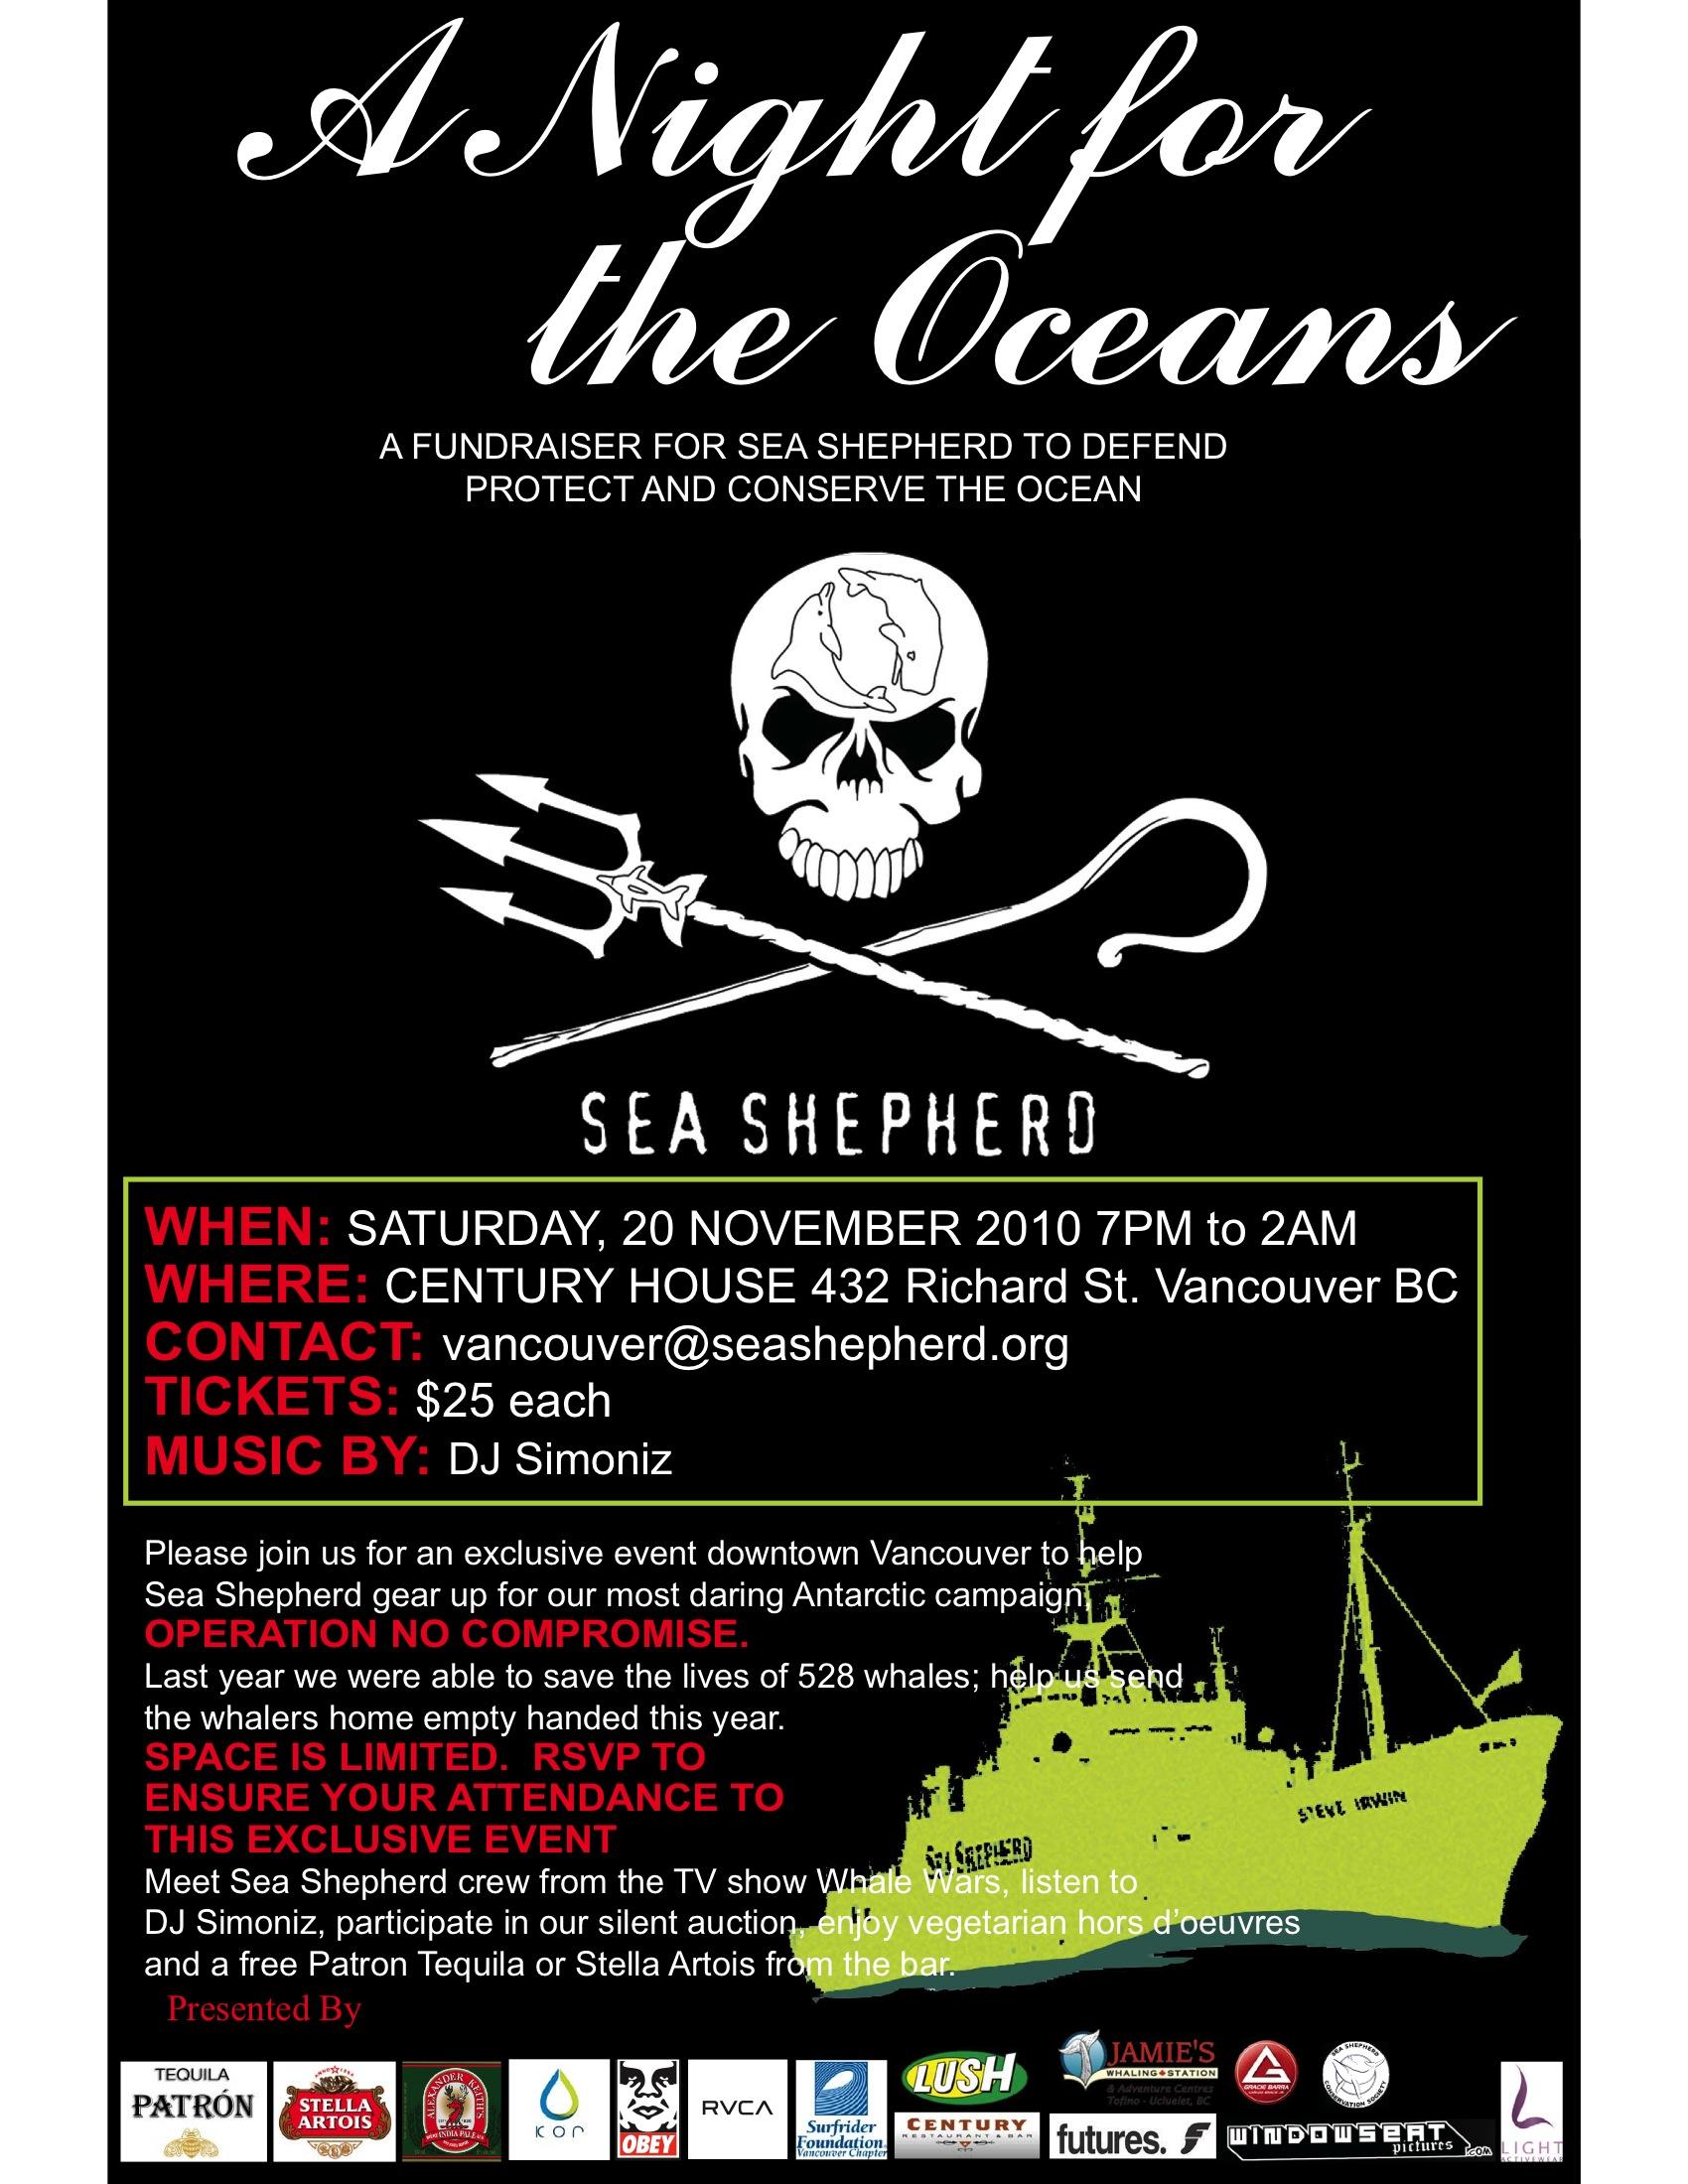 Antoine Lum, Sea Shepherd Conservation Society & Tarah Millen, Cove Guardian